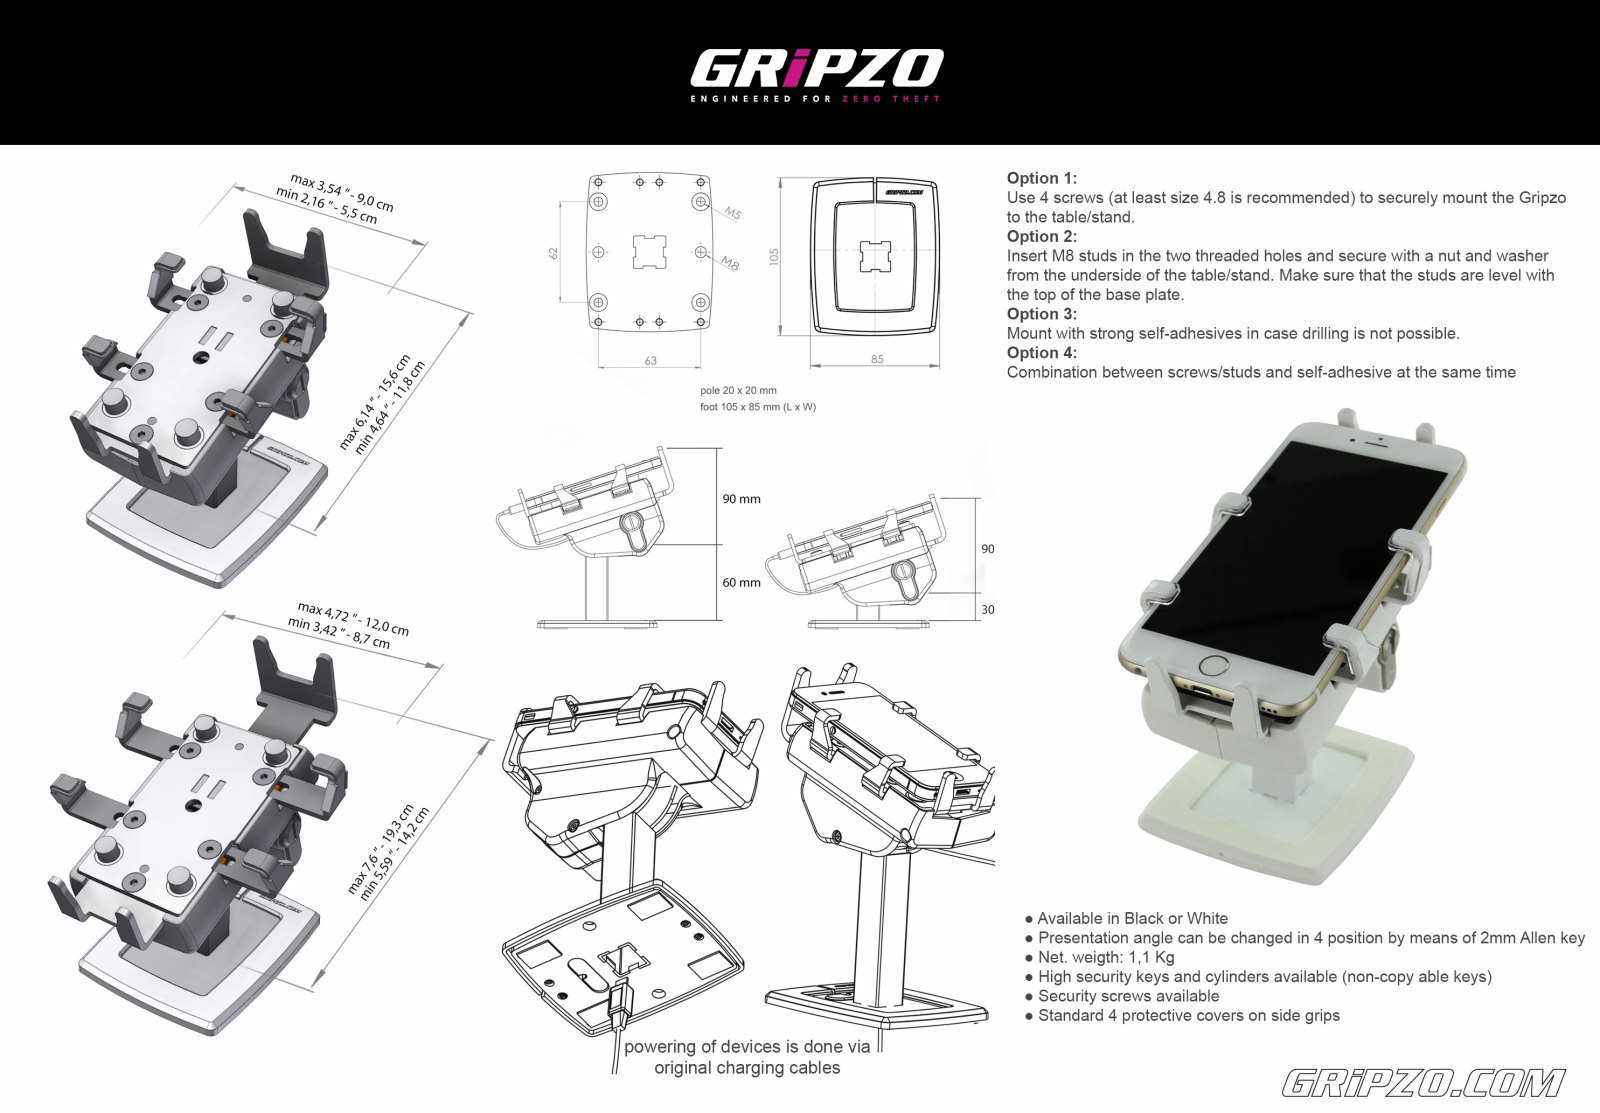 gripzo-smartphone-product-sheet-19-1-15.jpg